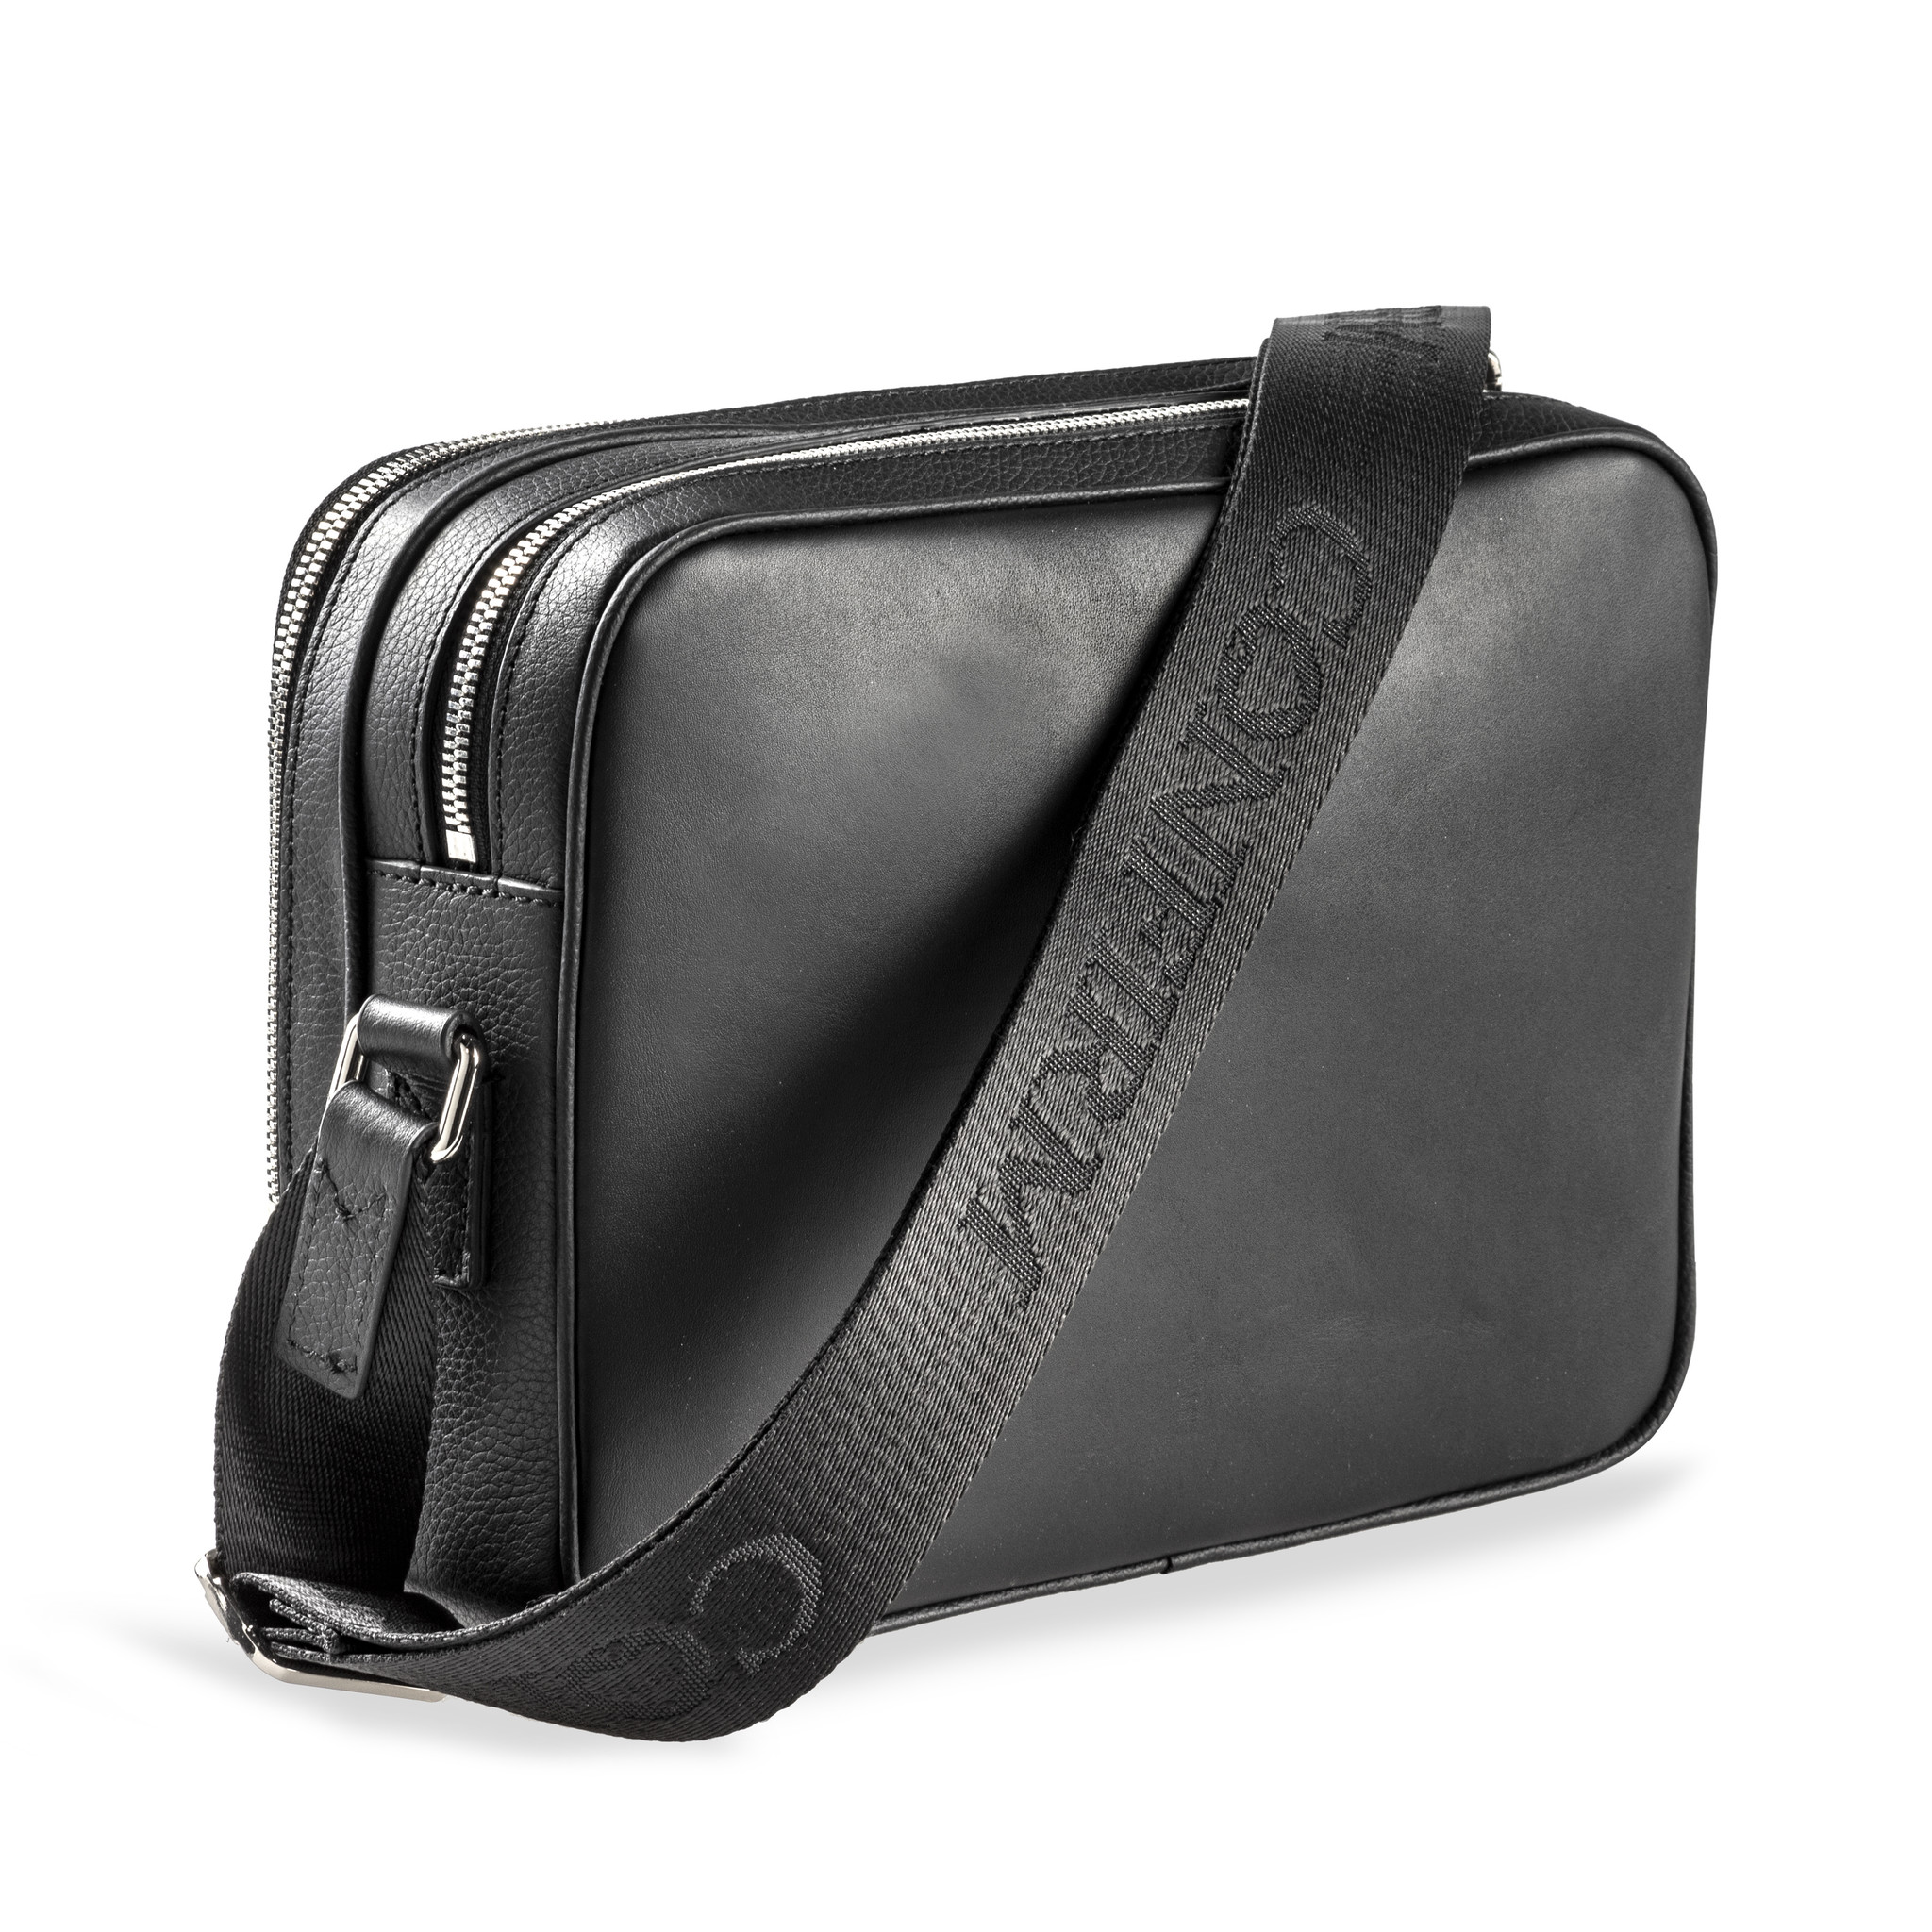 Confirm messenger bag Humero - smooth-4